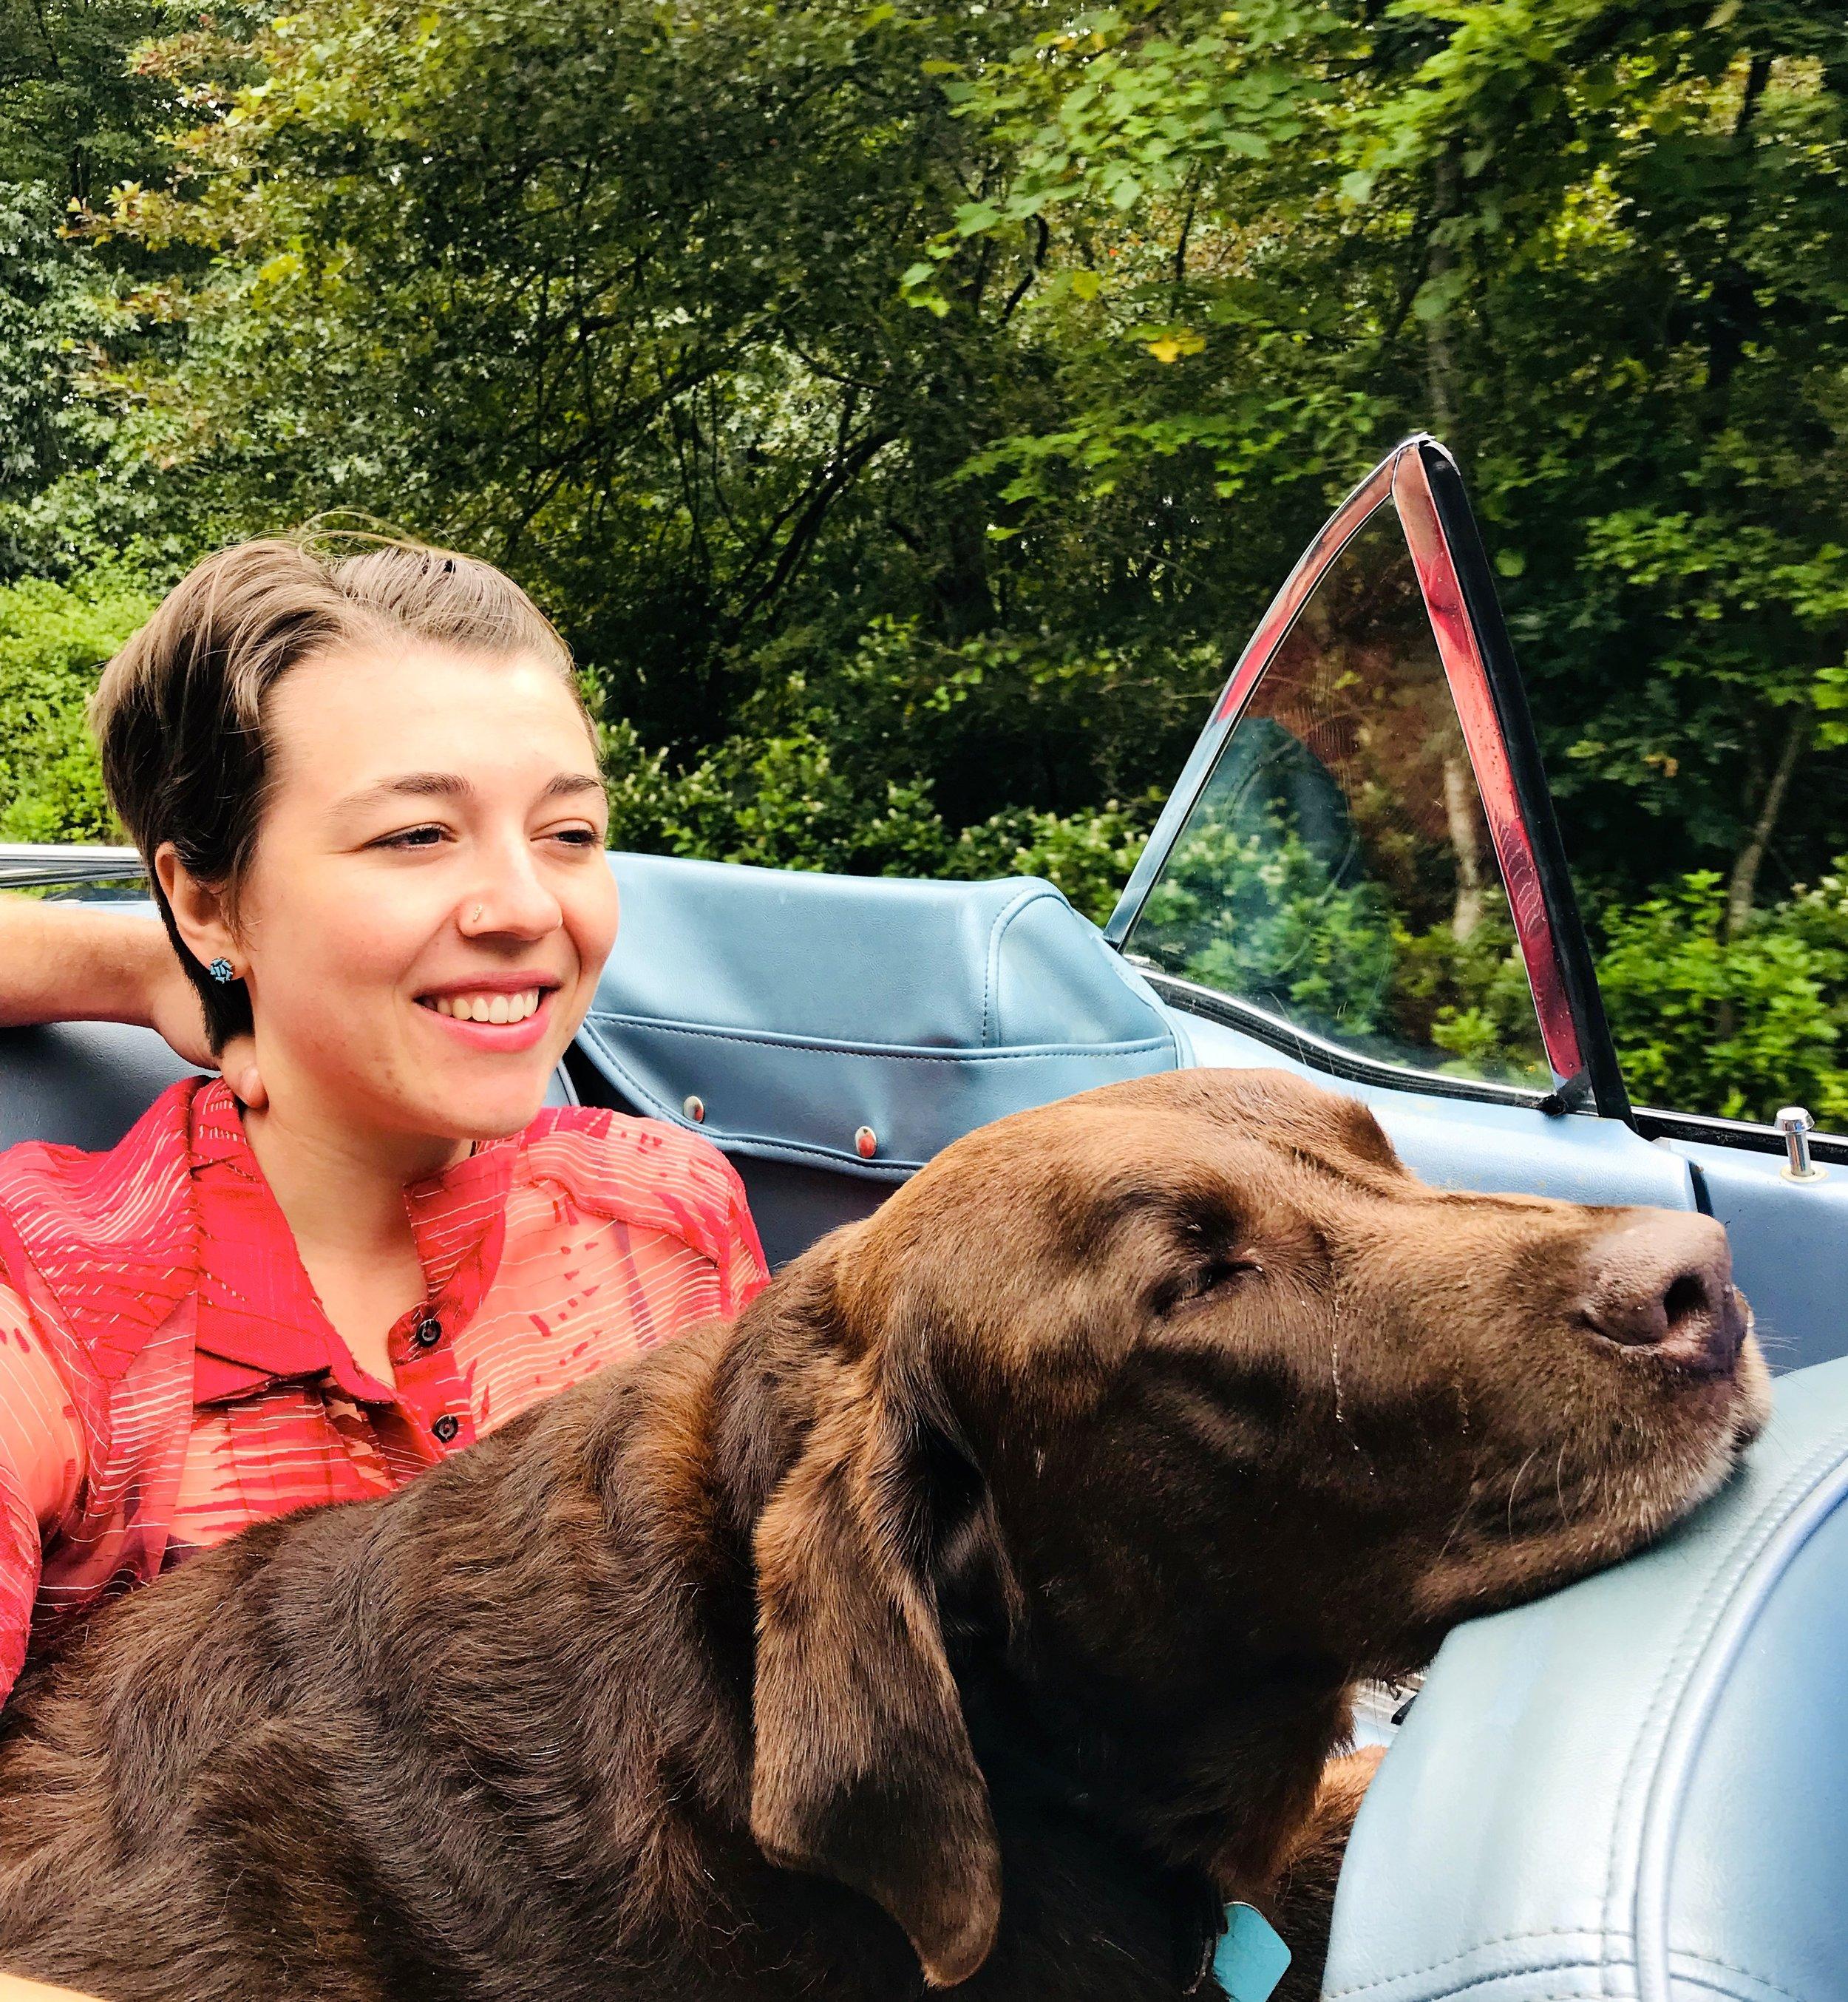 The graduate, Charlie, joy ride to Aquinnah